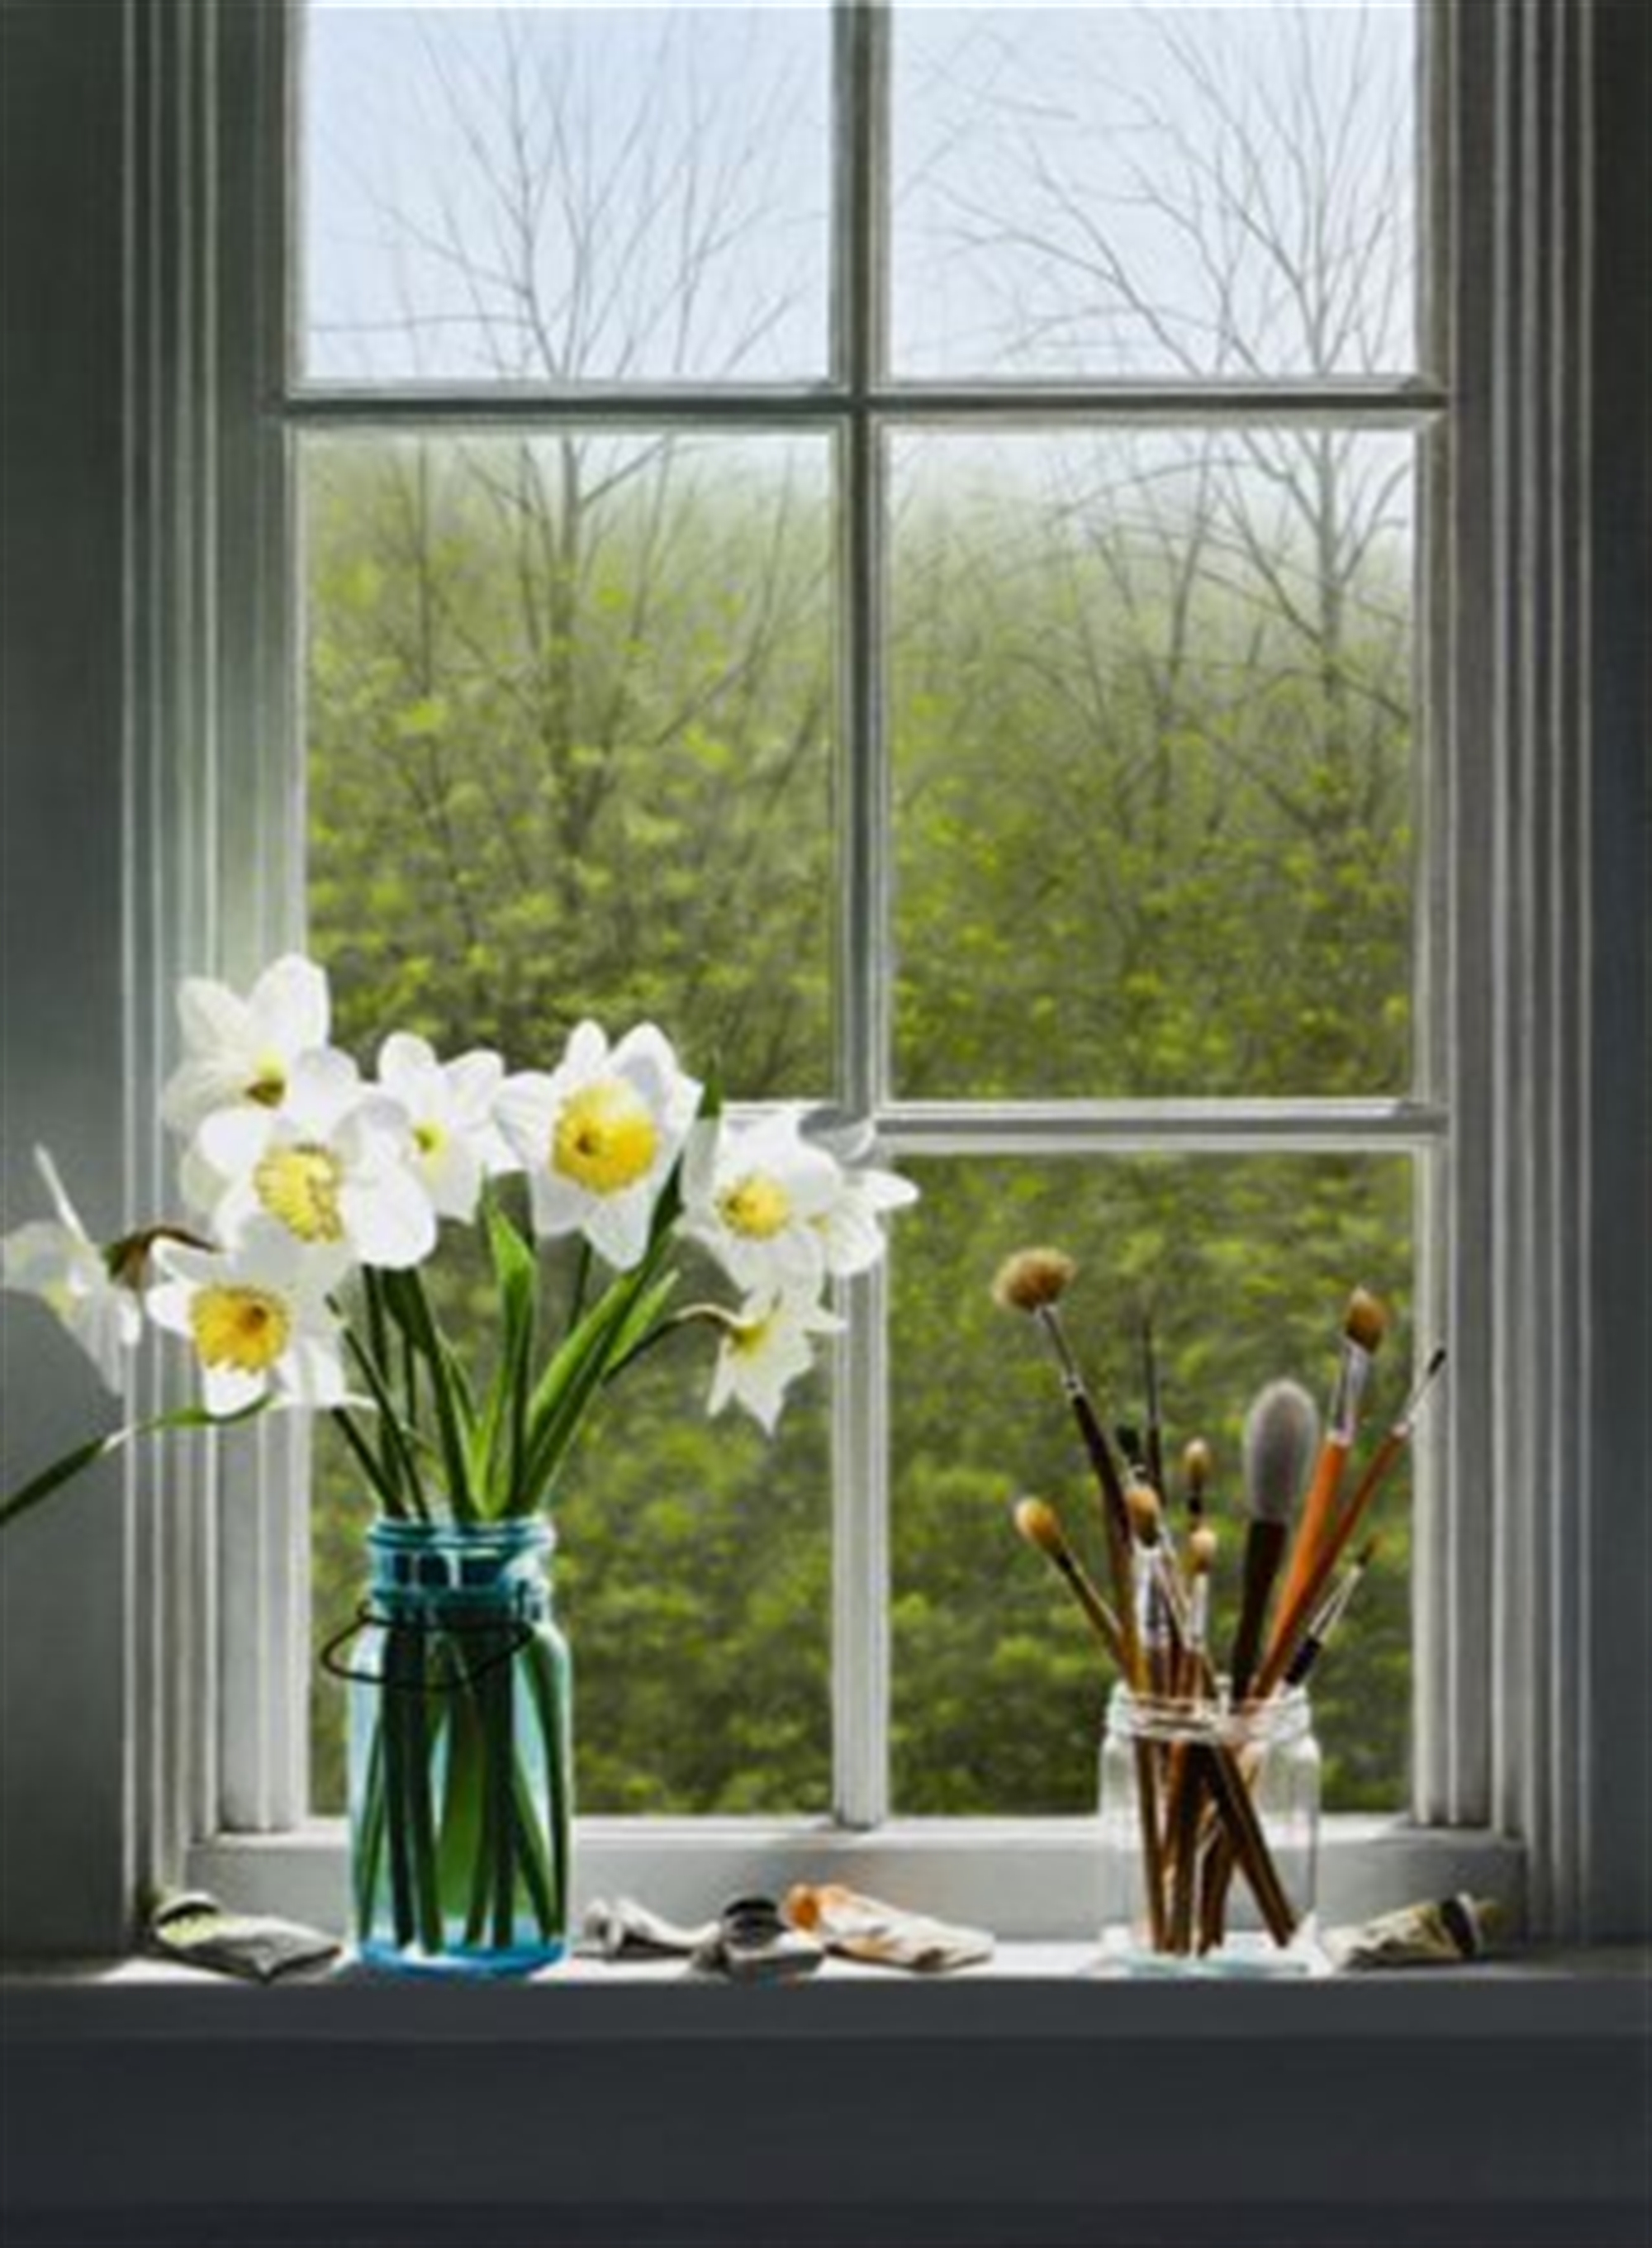 Colors of Spring by Alexander Volkov